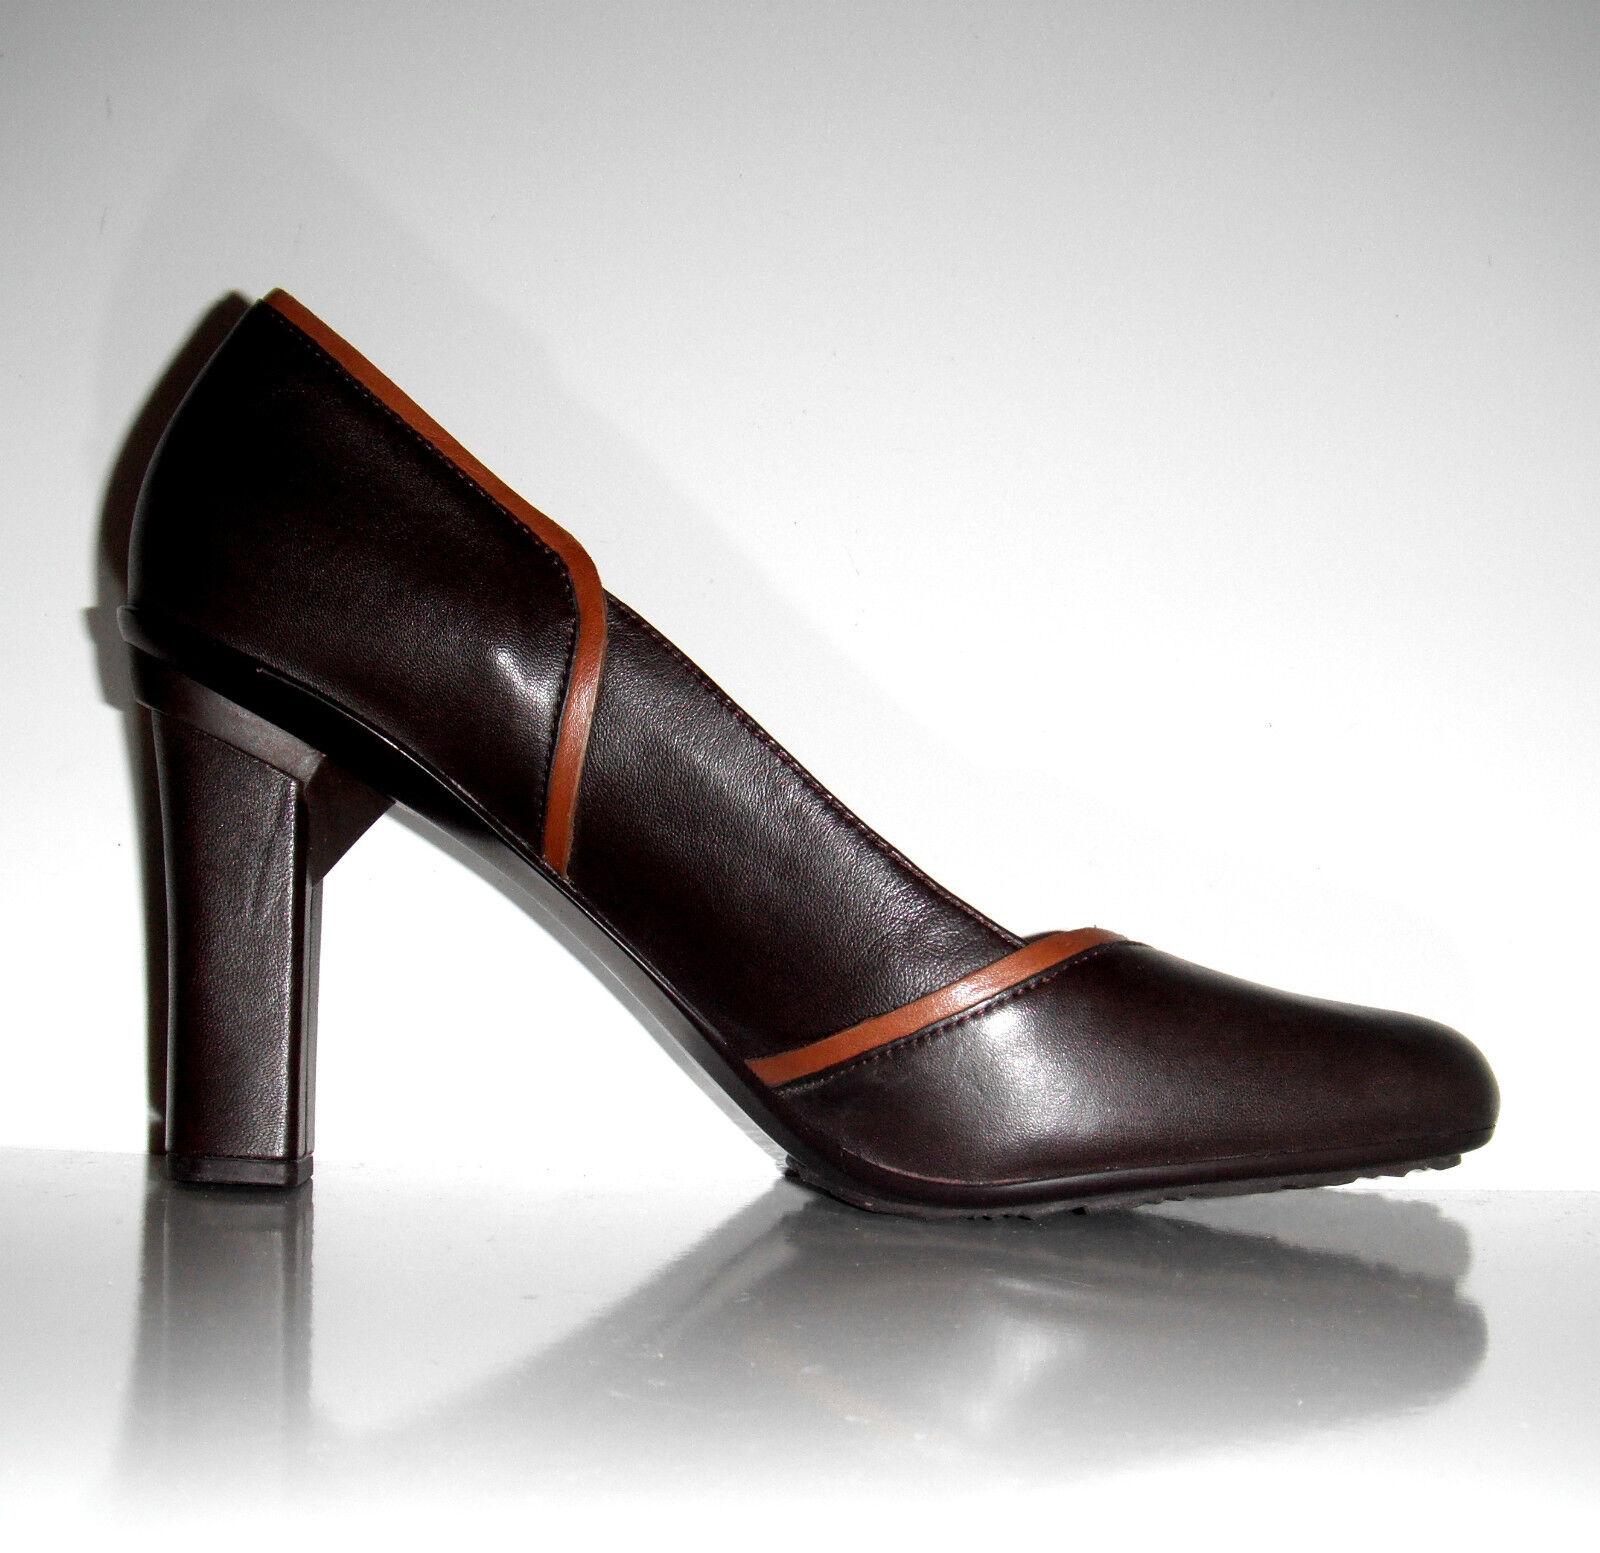 130 NEU Tsubo Avoca Dark Chocolate Leder Heel Elegant Schuhe sz 10